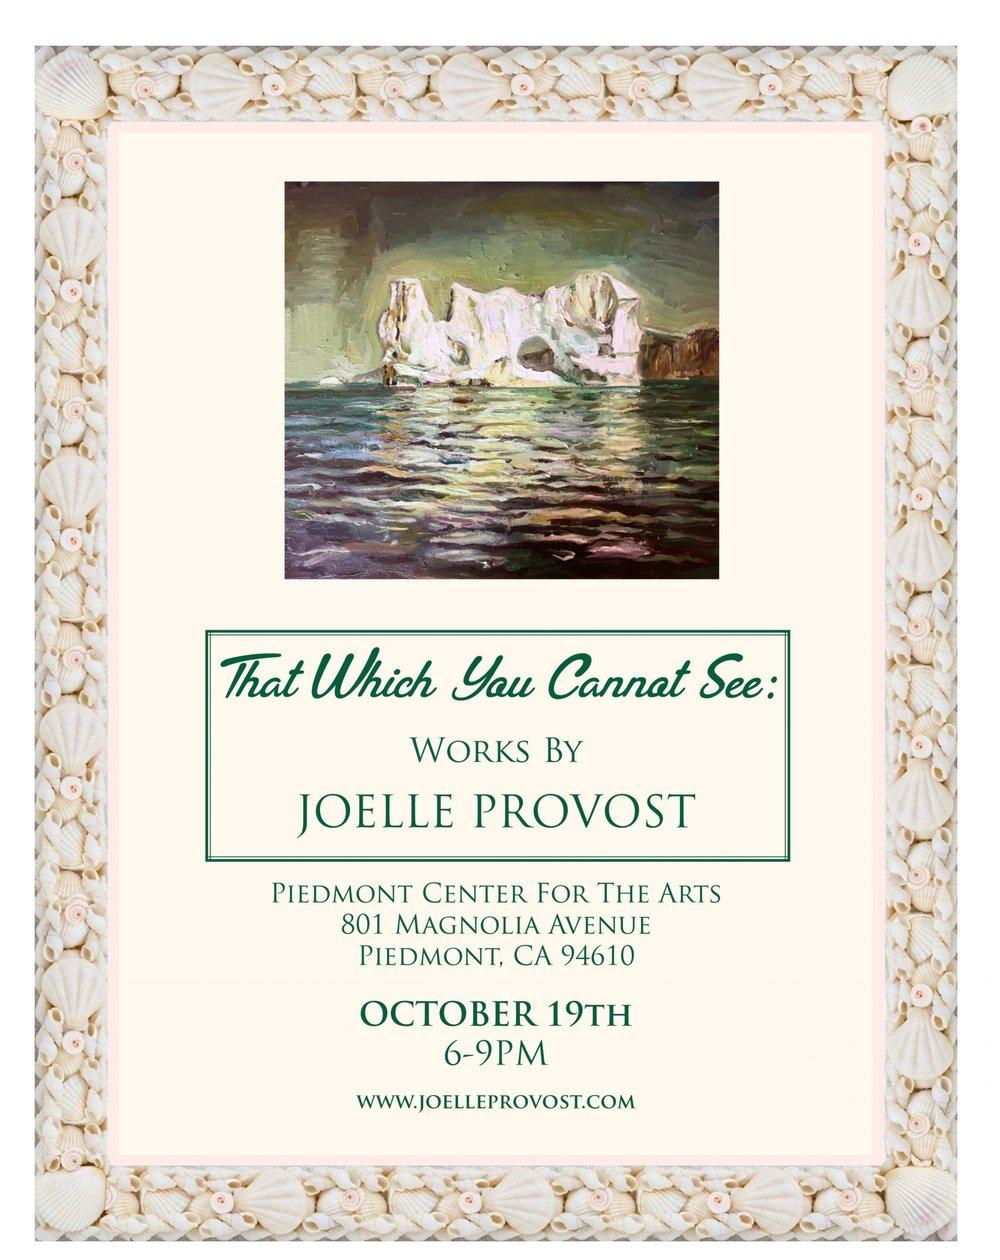 Joelle Flyer October 2018.jpg